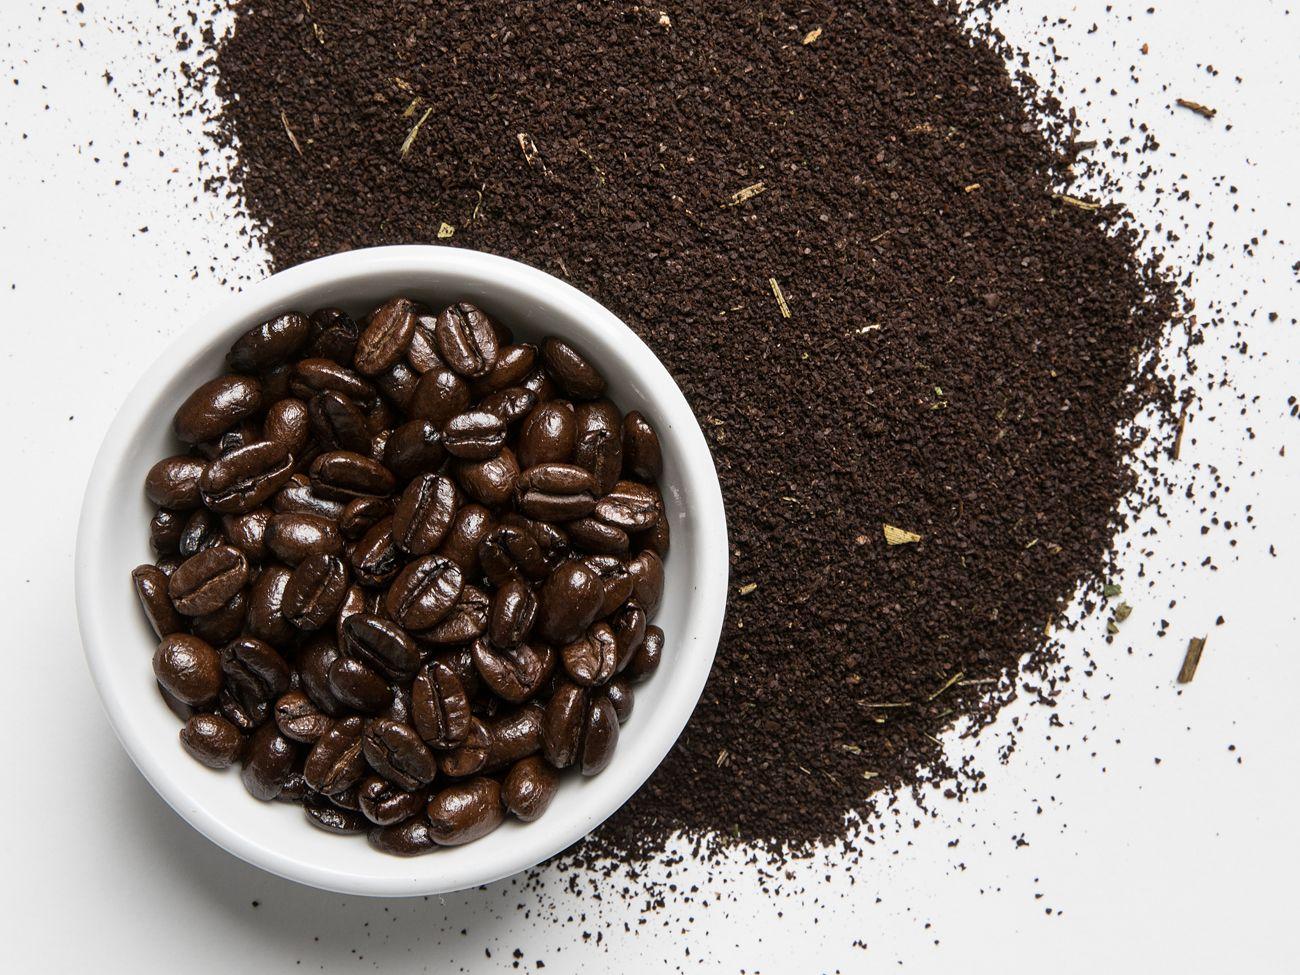 rect-beans-grinds-herbs-compressor.jpg